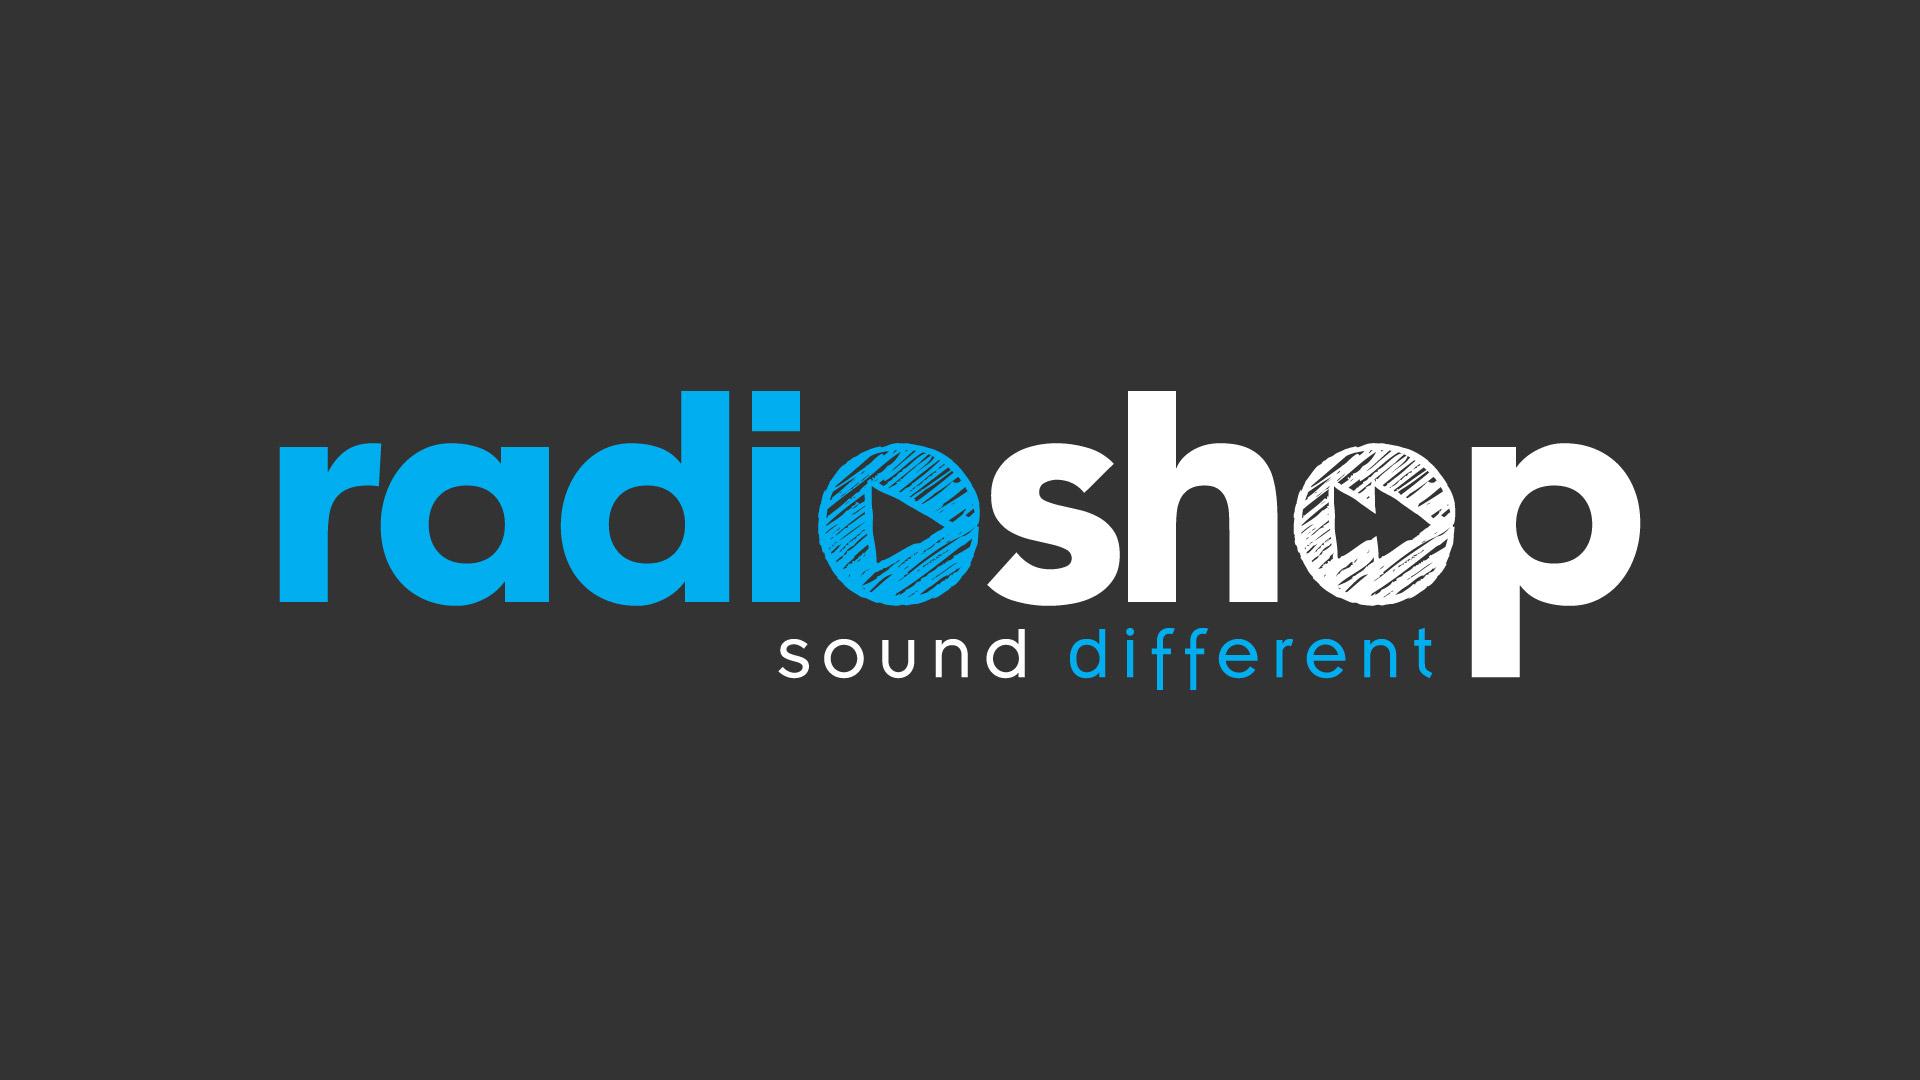 radioshop-creation-logo-identite-visuelle-charte-graphique-caconcept-alexis-cretin-graphiste-montpellier